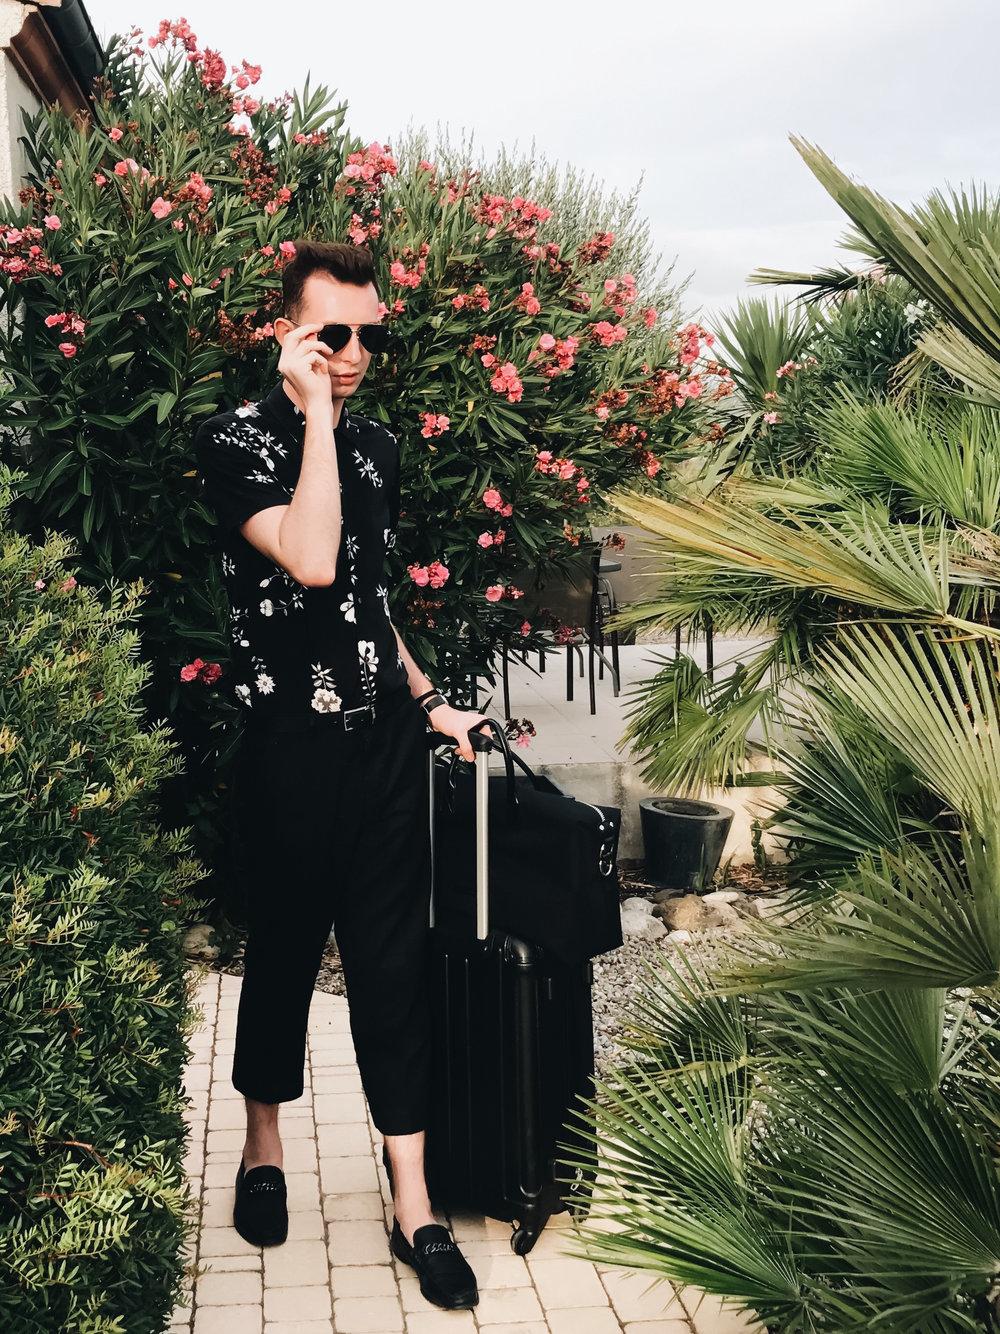 Jordan Simpson - London, England | Lifestyle, Fashion & Grooming